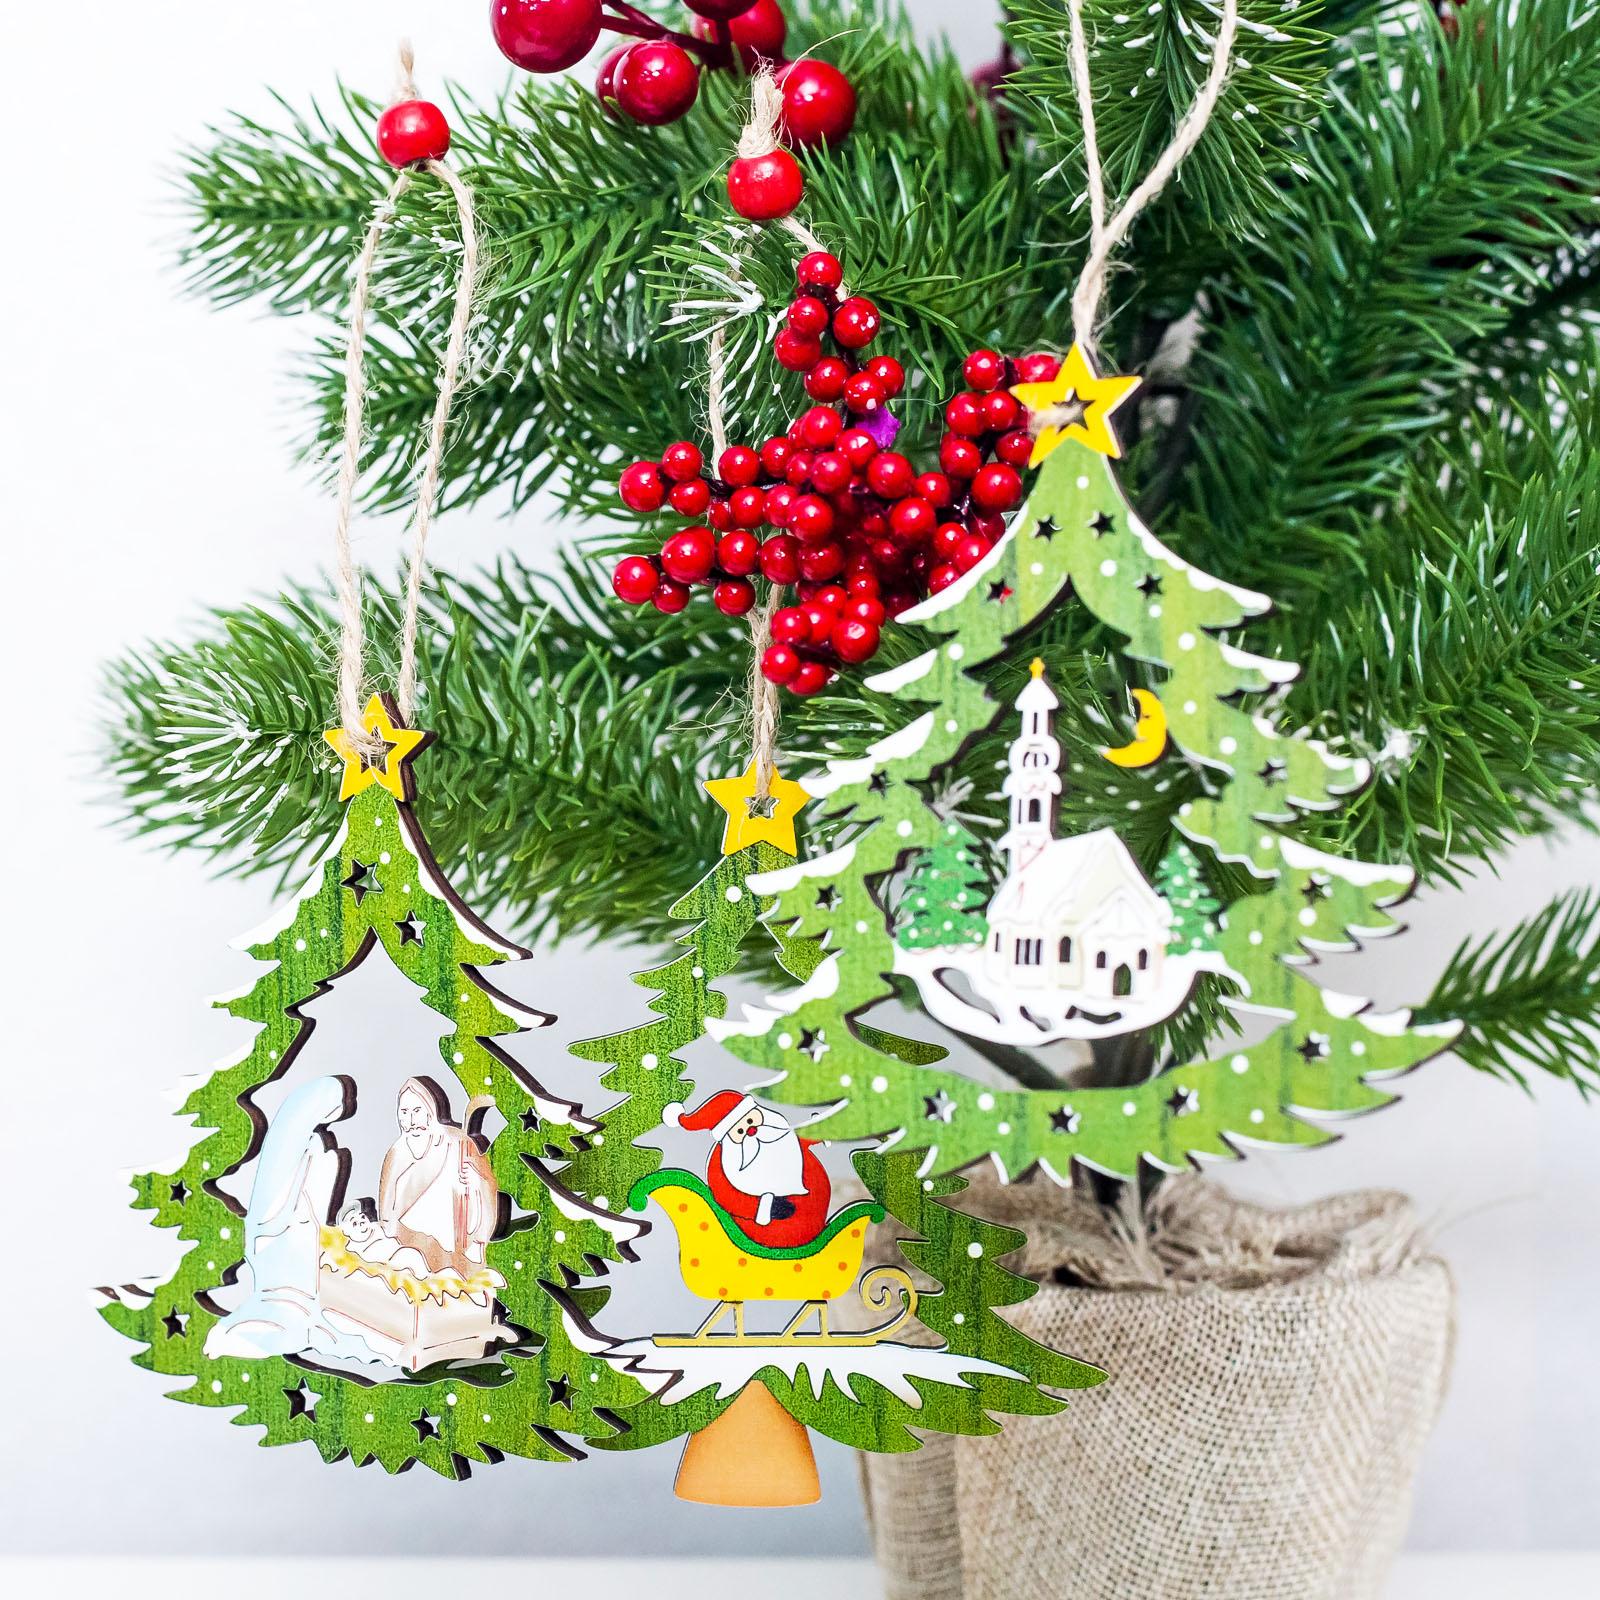 Beautiful Christmas Tree Pictures: Aliexpress.com : Buy 10x11cm Beautiful Hollow Christmas